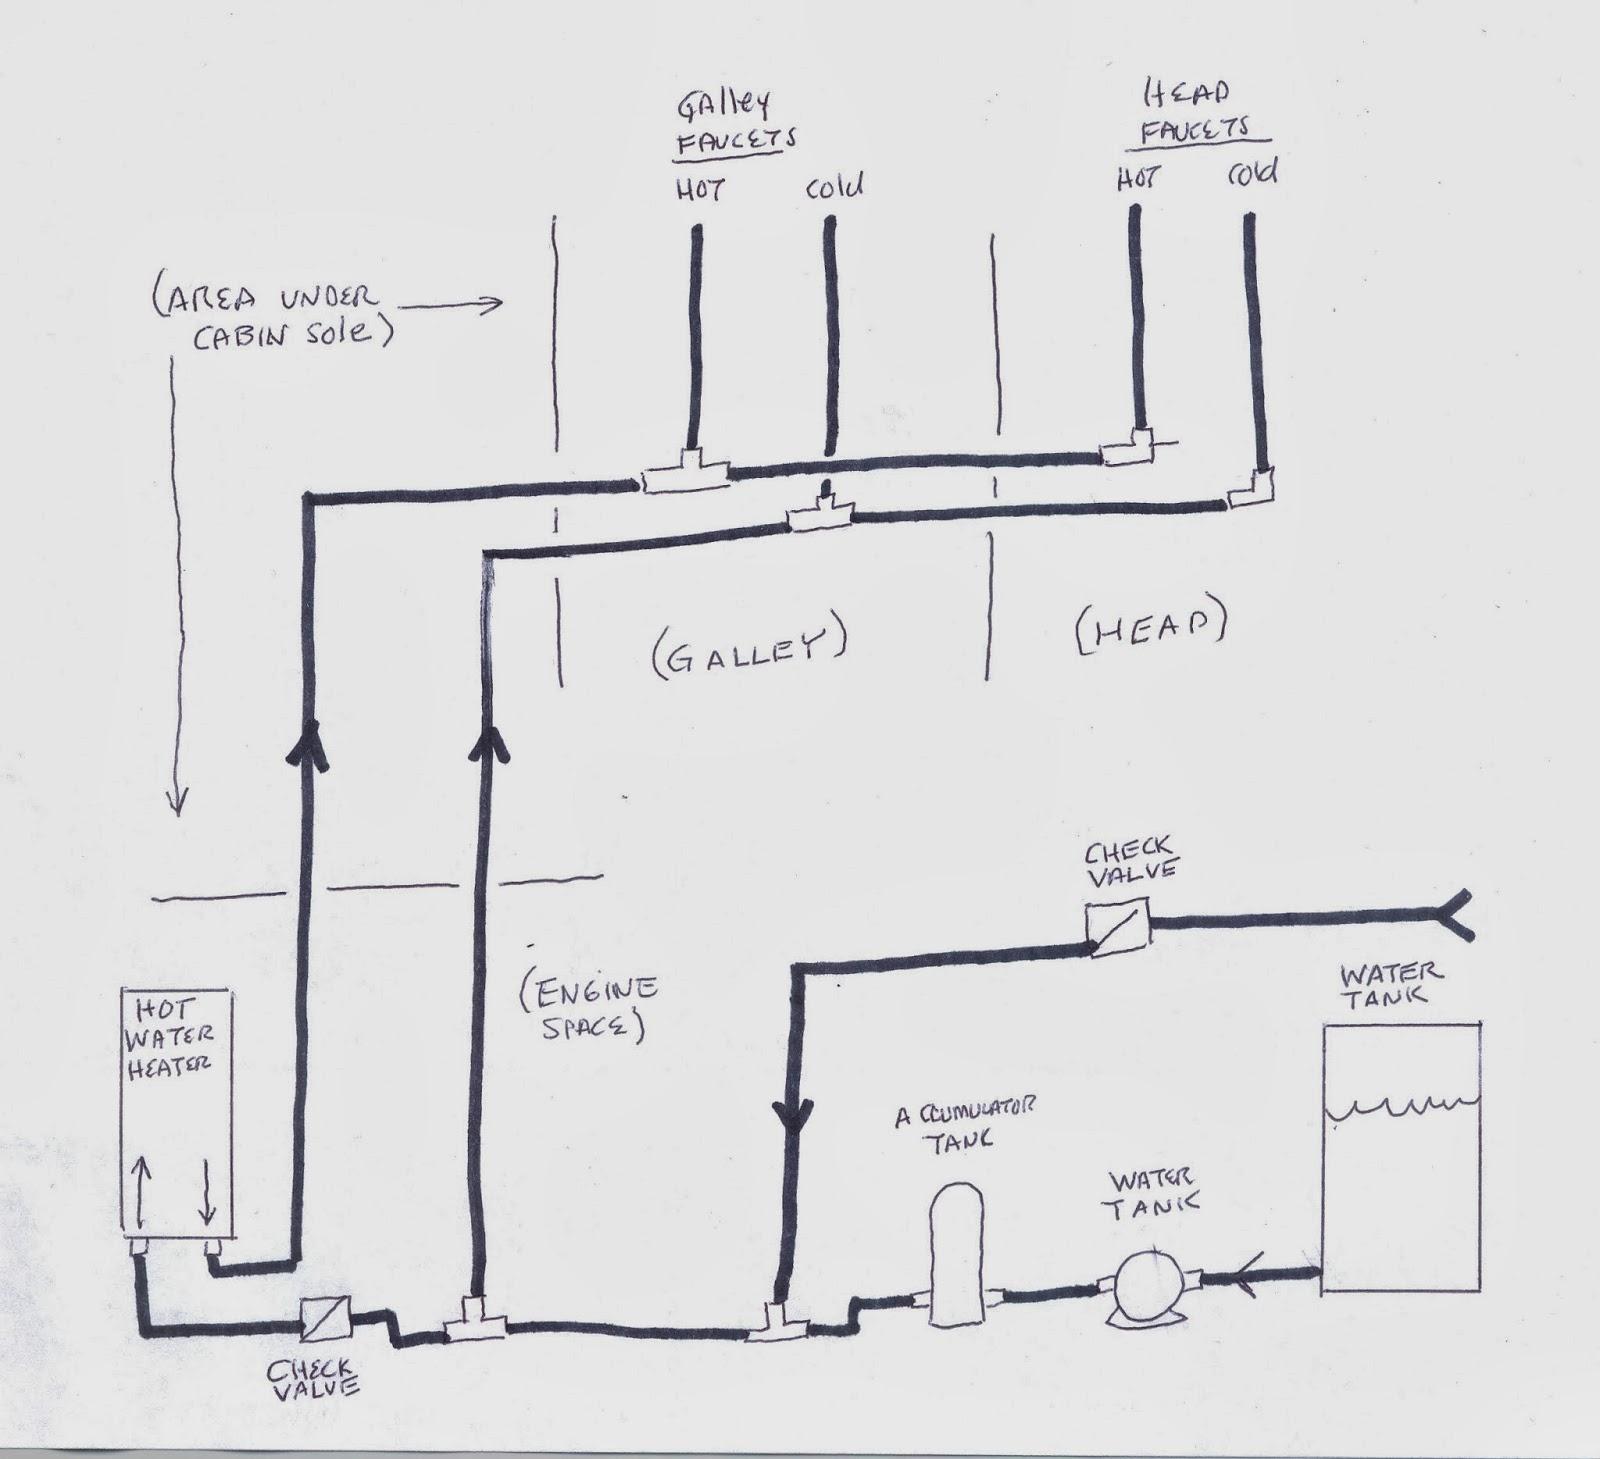 rv plumbing schematics